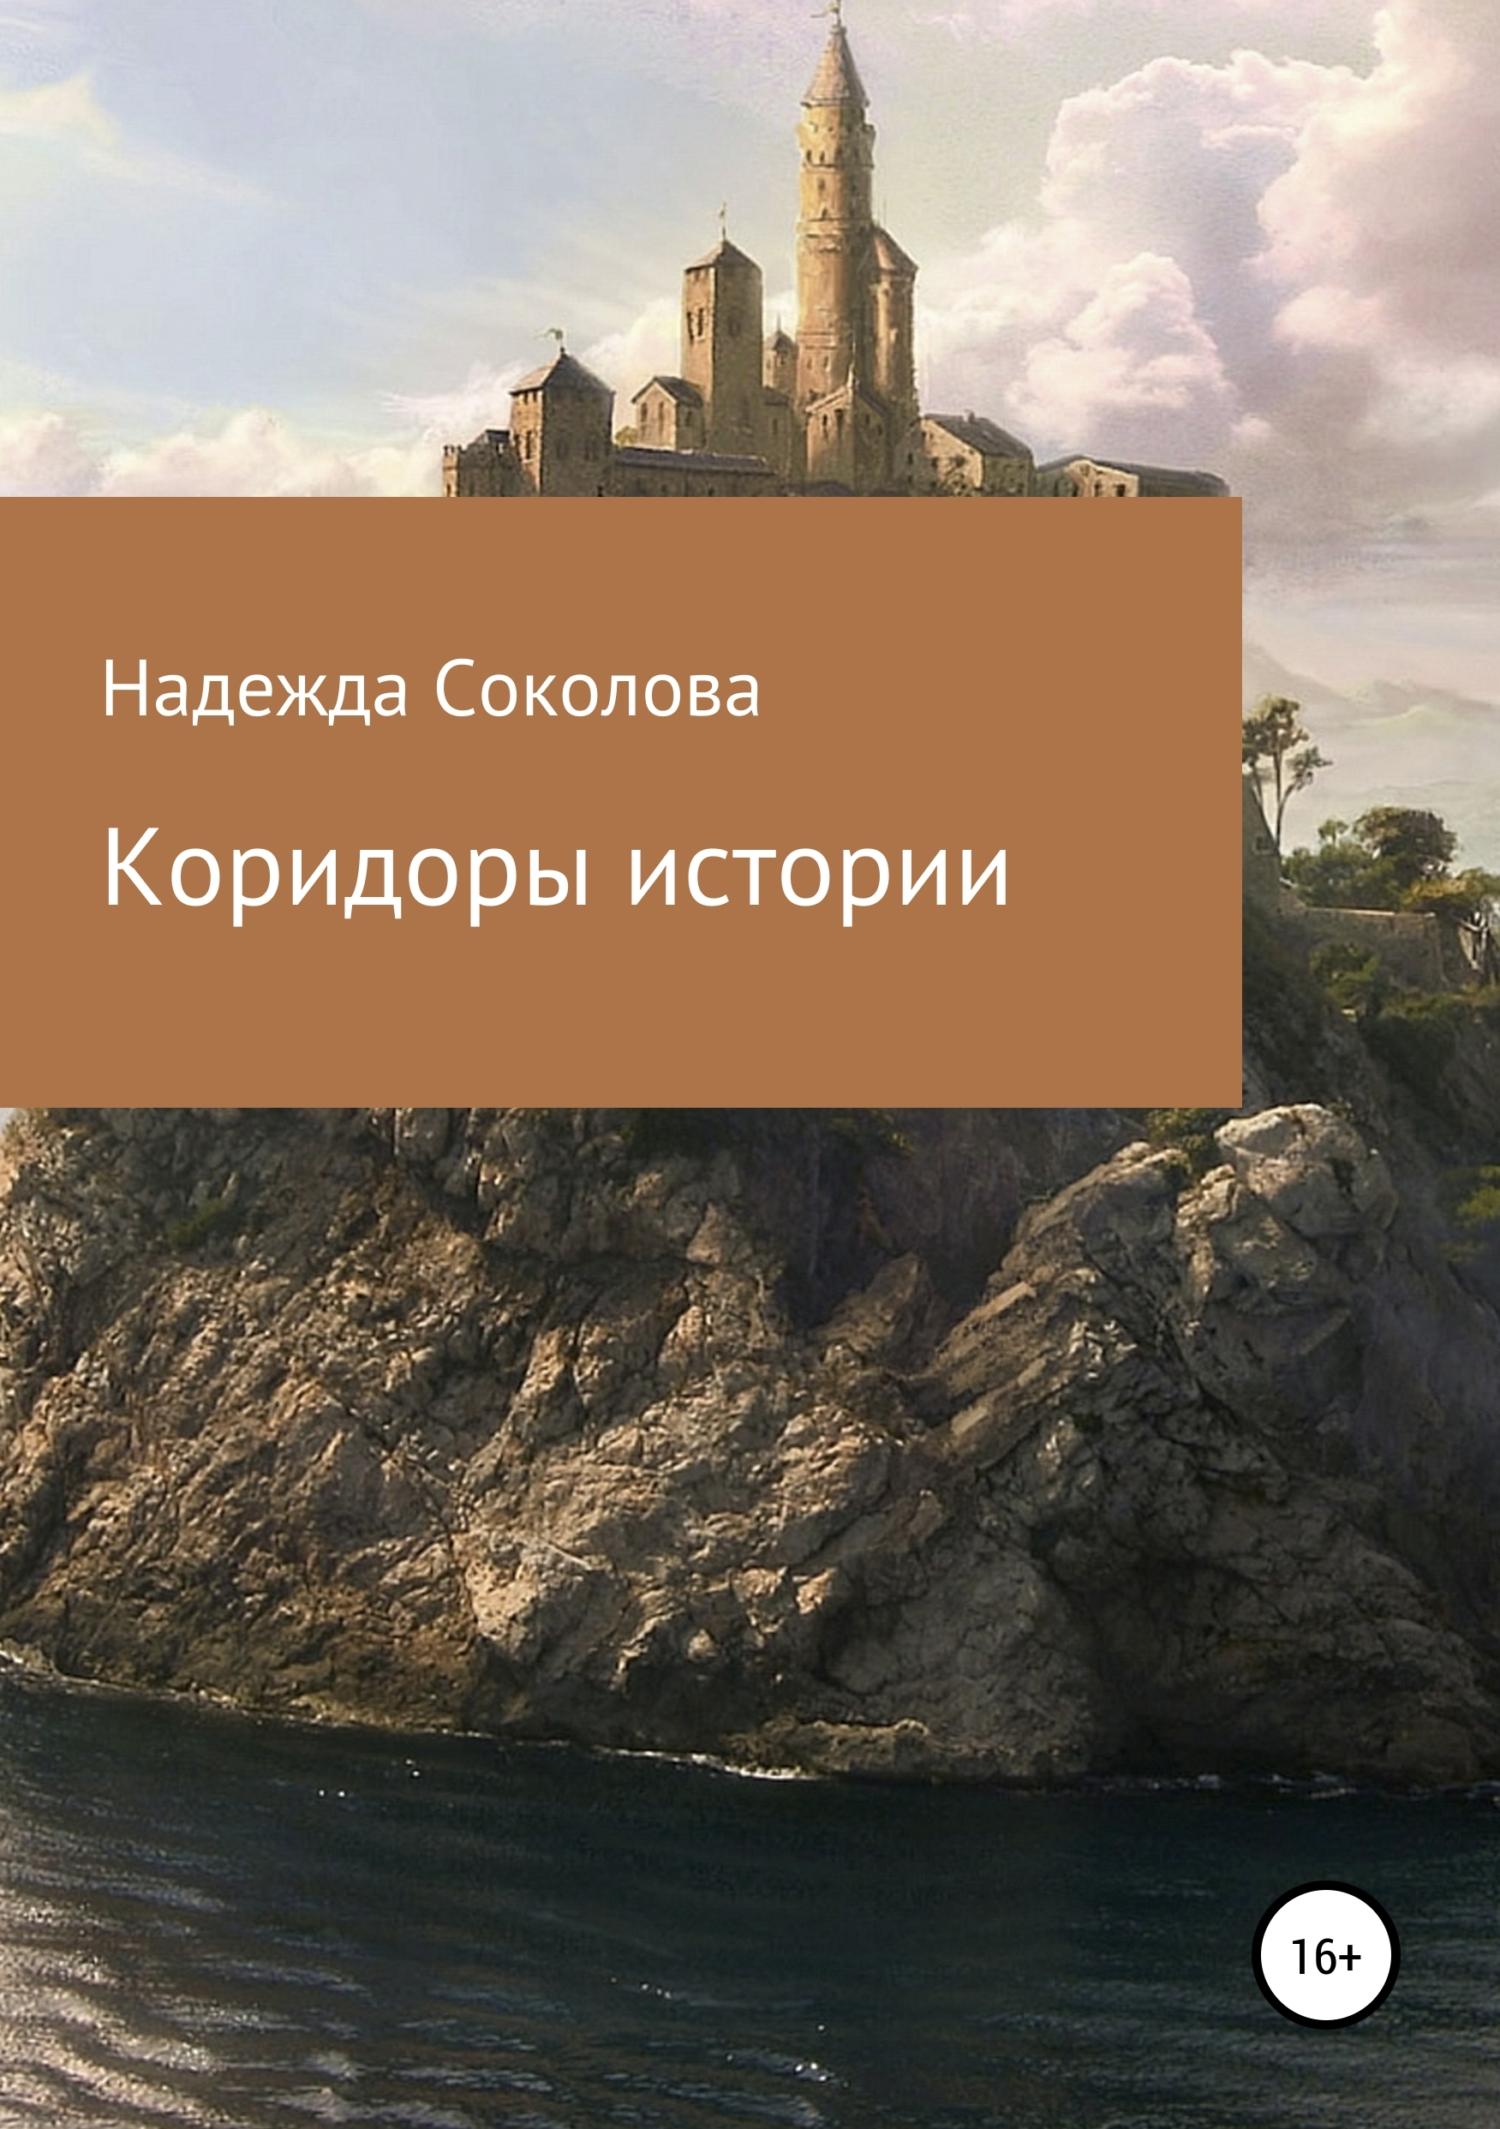 Надежда Игоревна Соколова Коридоры истории цена